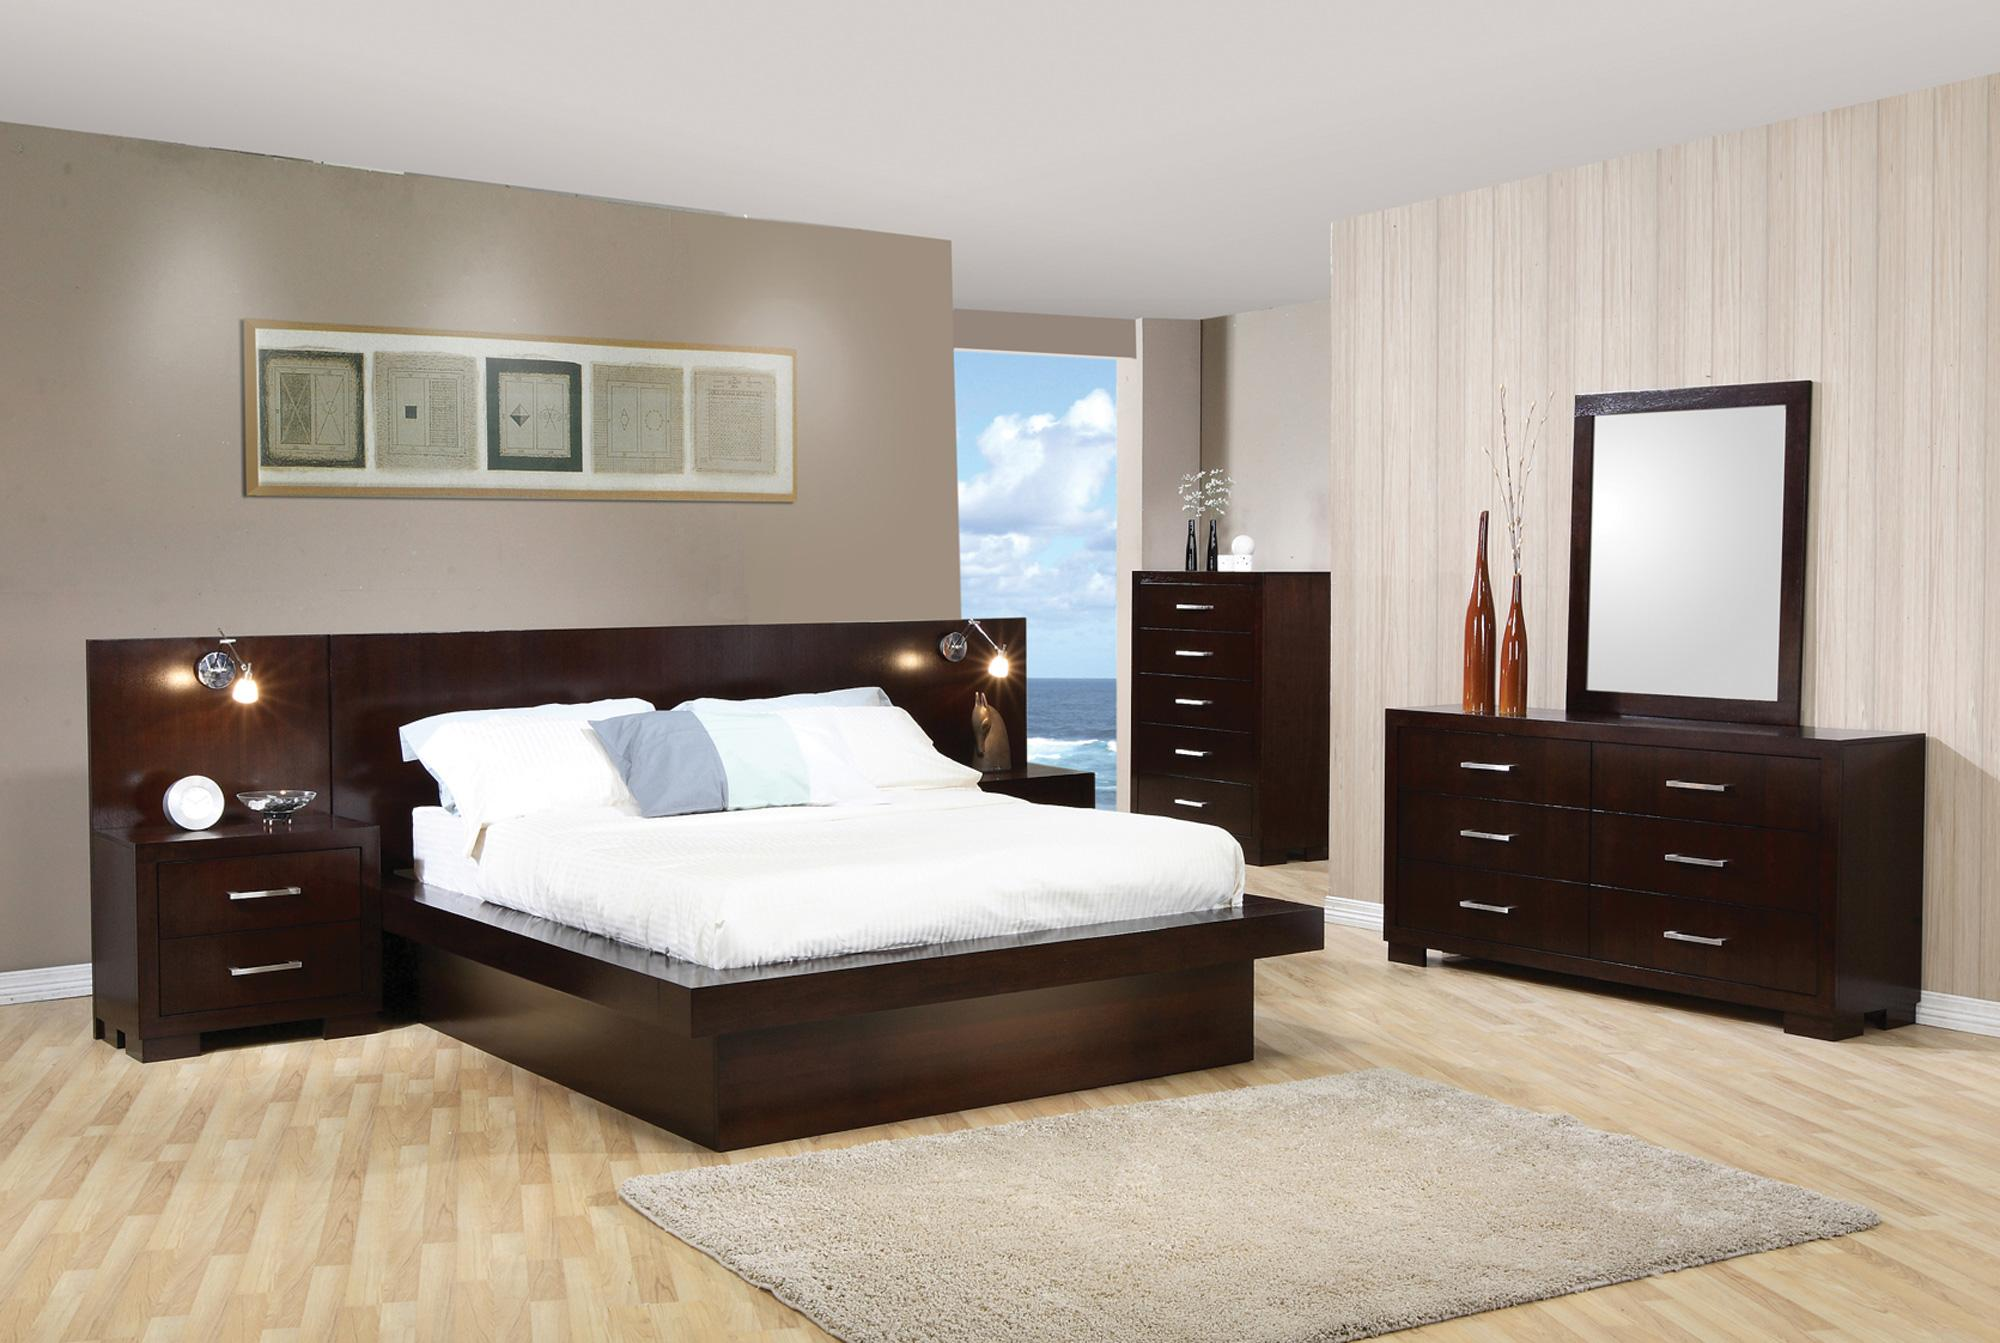 Coaster Jessica King Bedroom Group - Item Number: 200170 King Bedroom Group 1